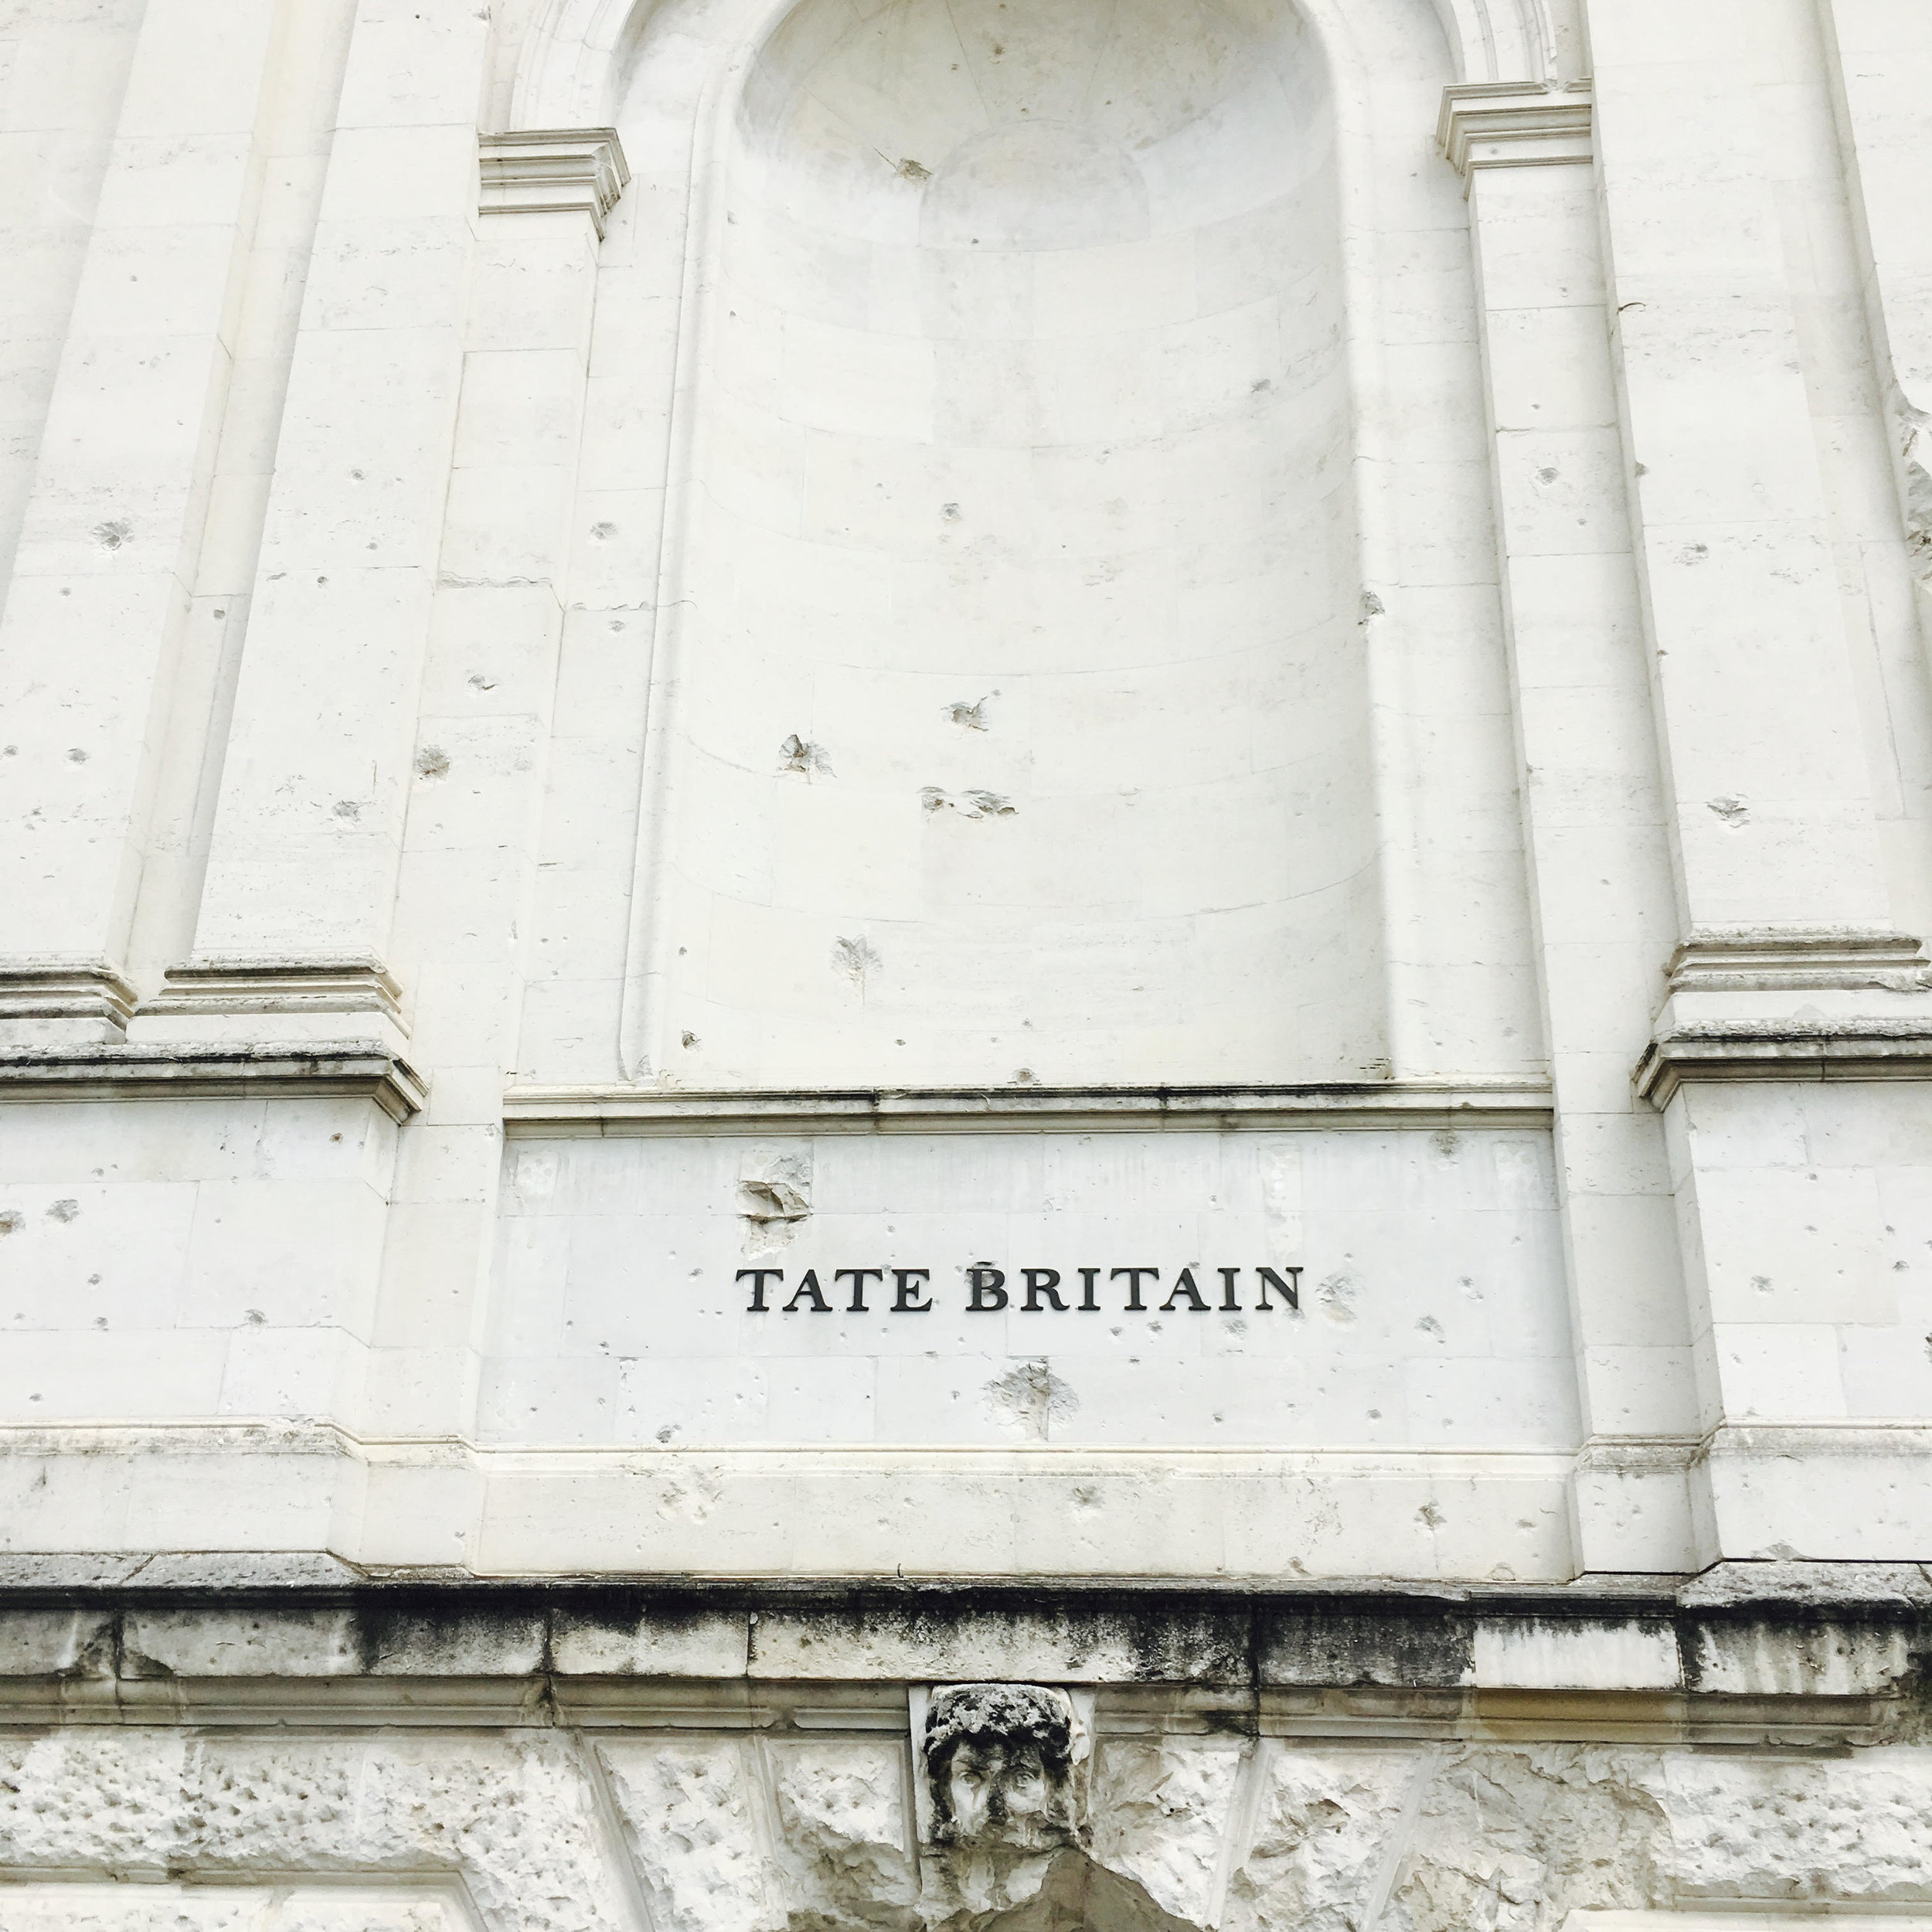 Tate Britain side entrance bullet holes